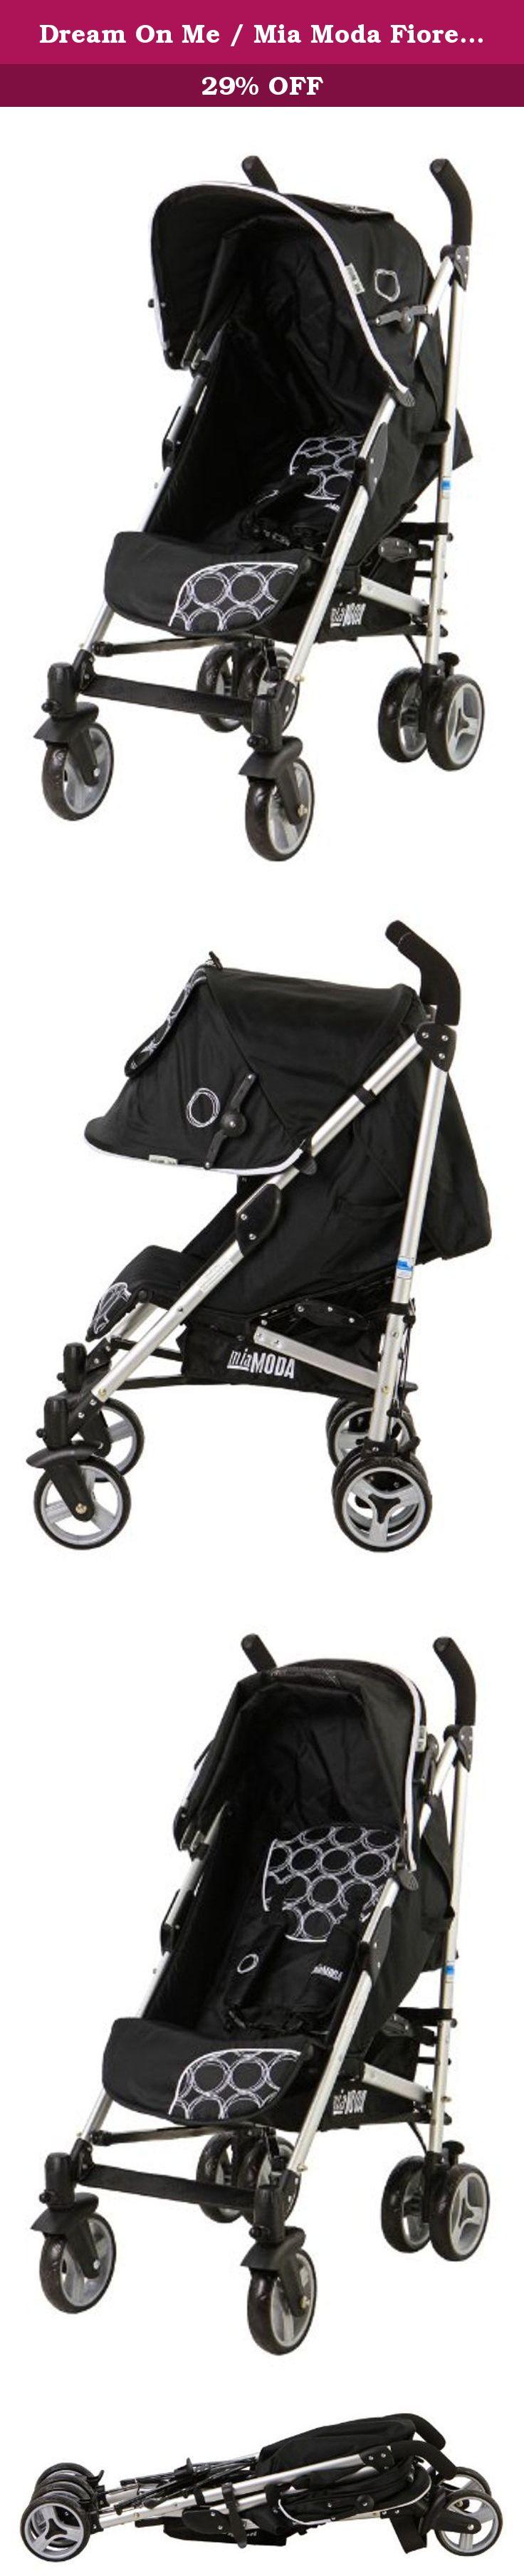 25++ Dream on me stroller accessories information